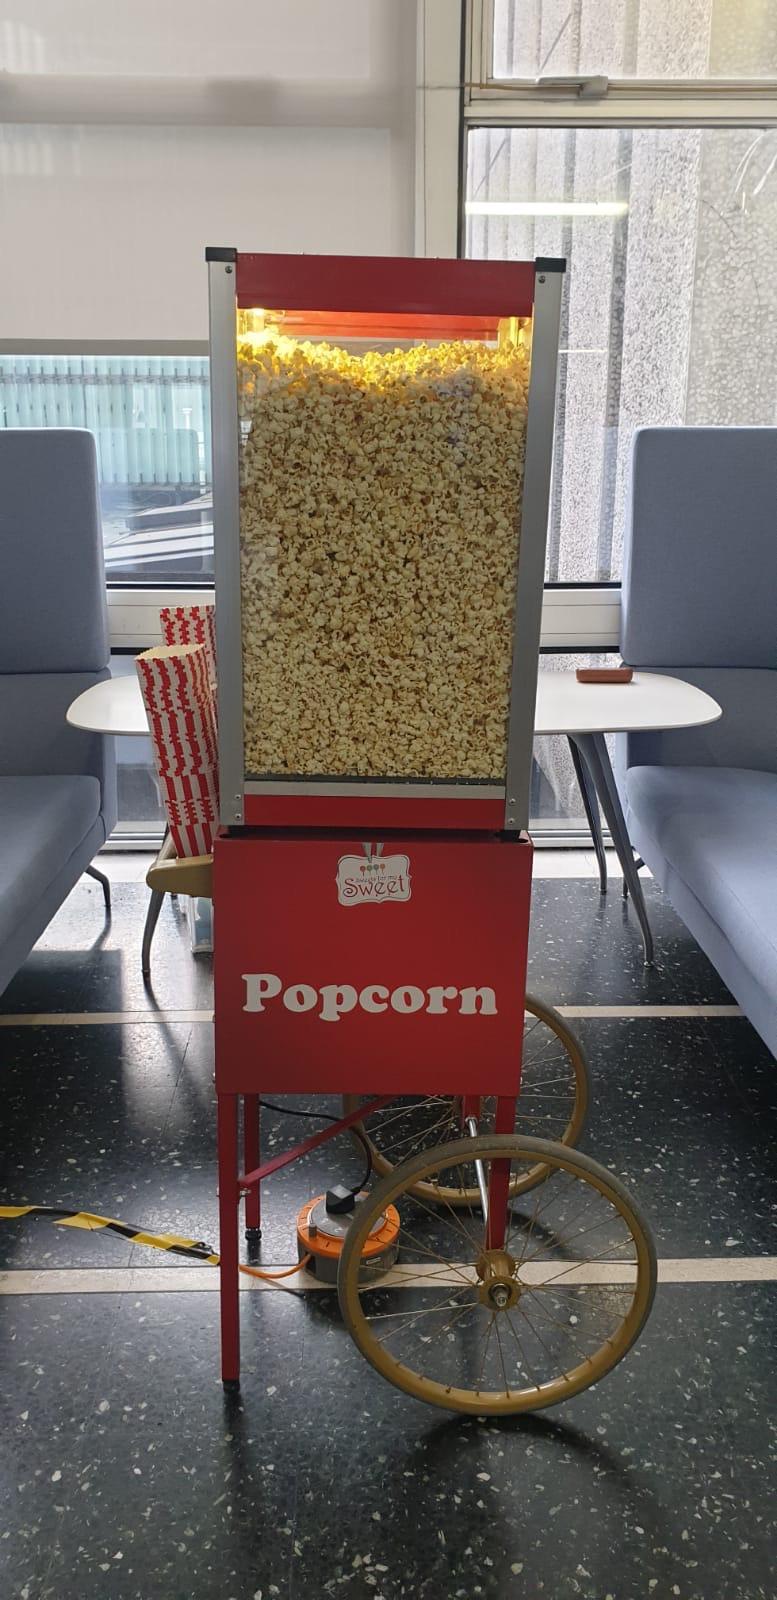 Popcorn hire Celtic Manor Newport